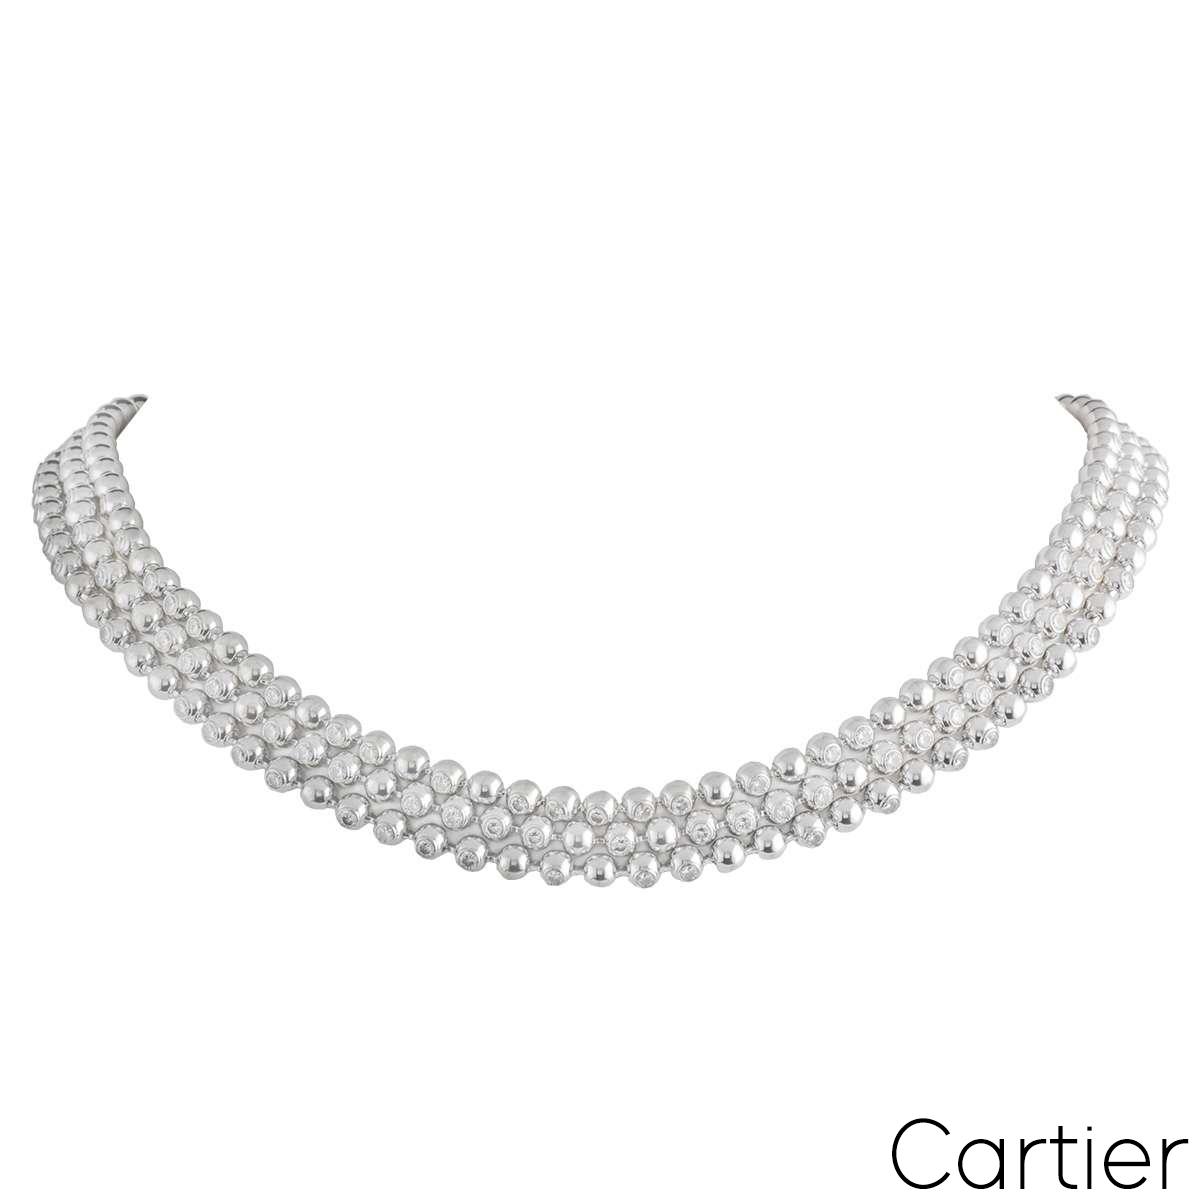 Cartier Moonlight Diamond Necklace